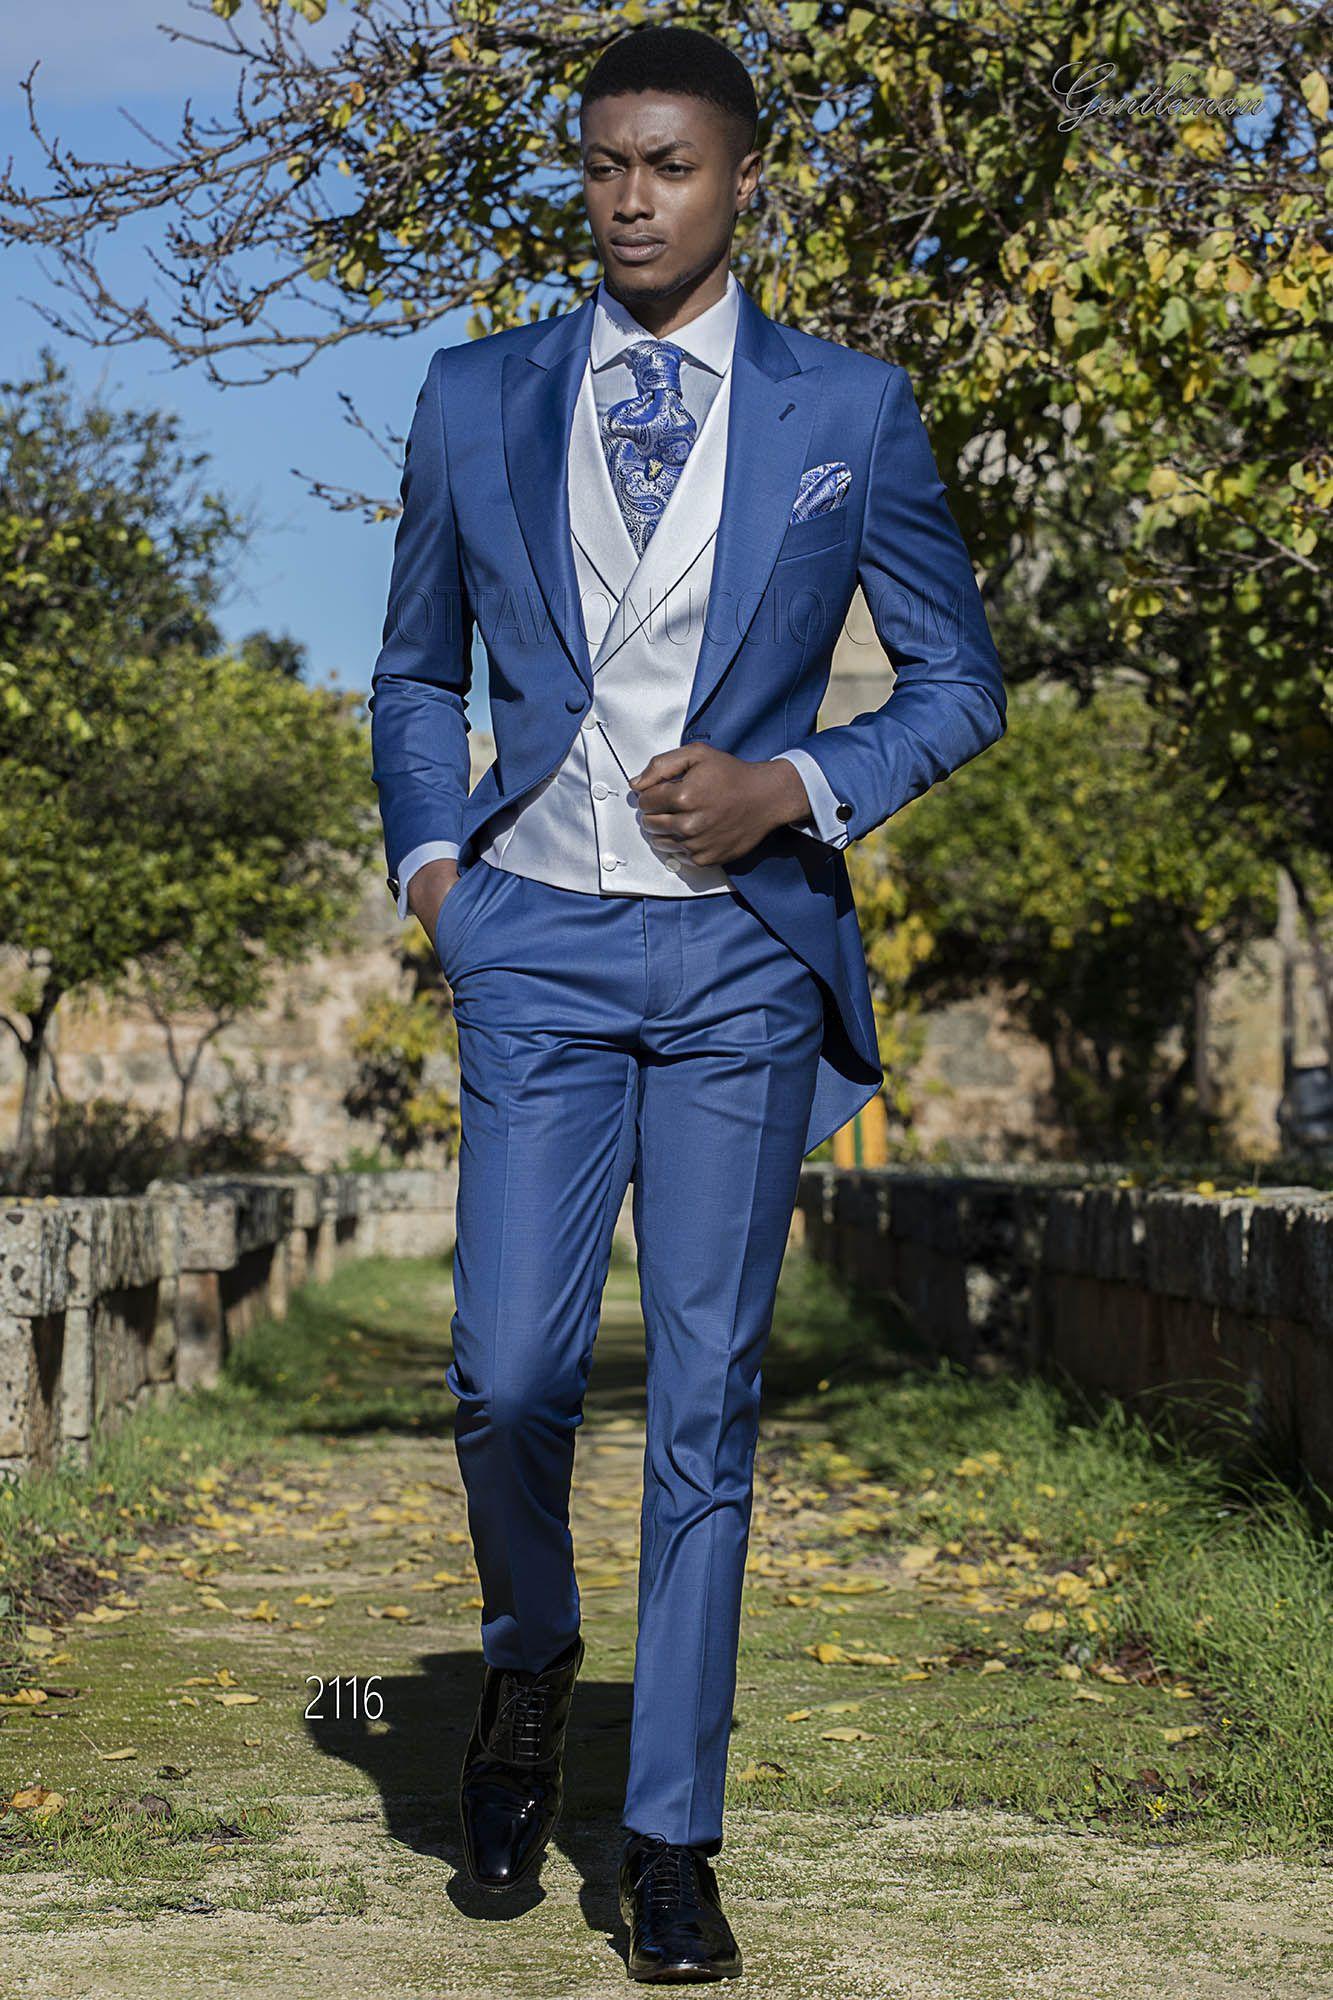 Abito da sposo blu royal con gilet bianco. Completo ONGala 2116 ... ed87fa3e1e7